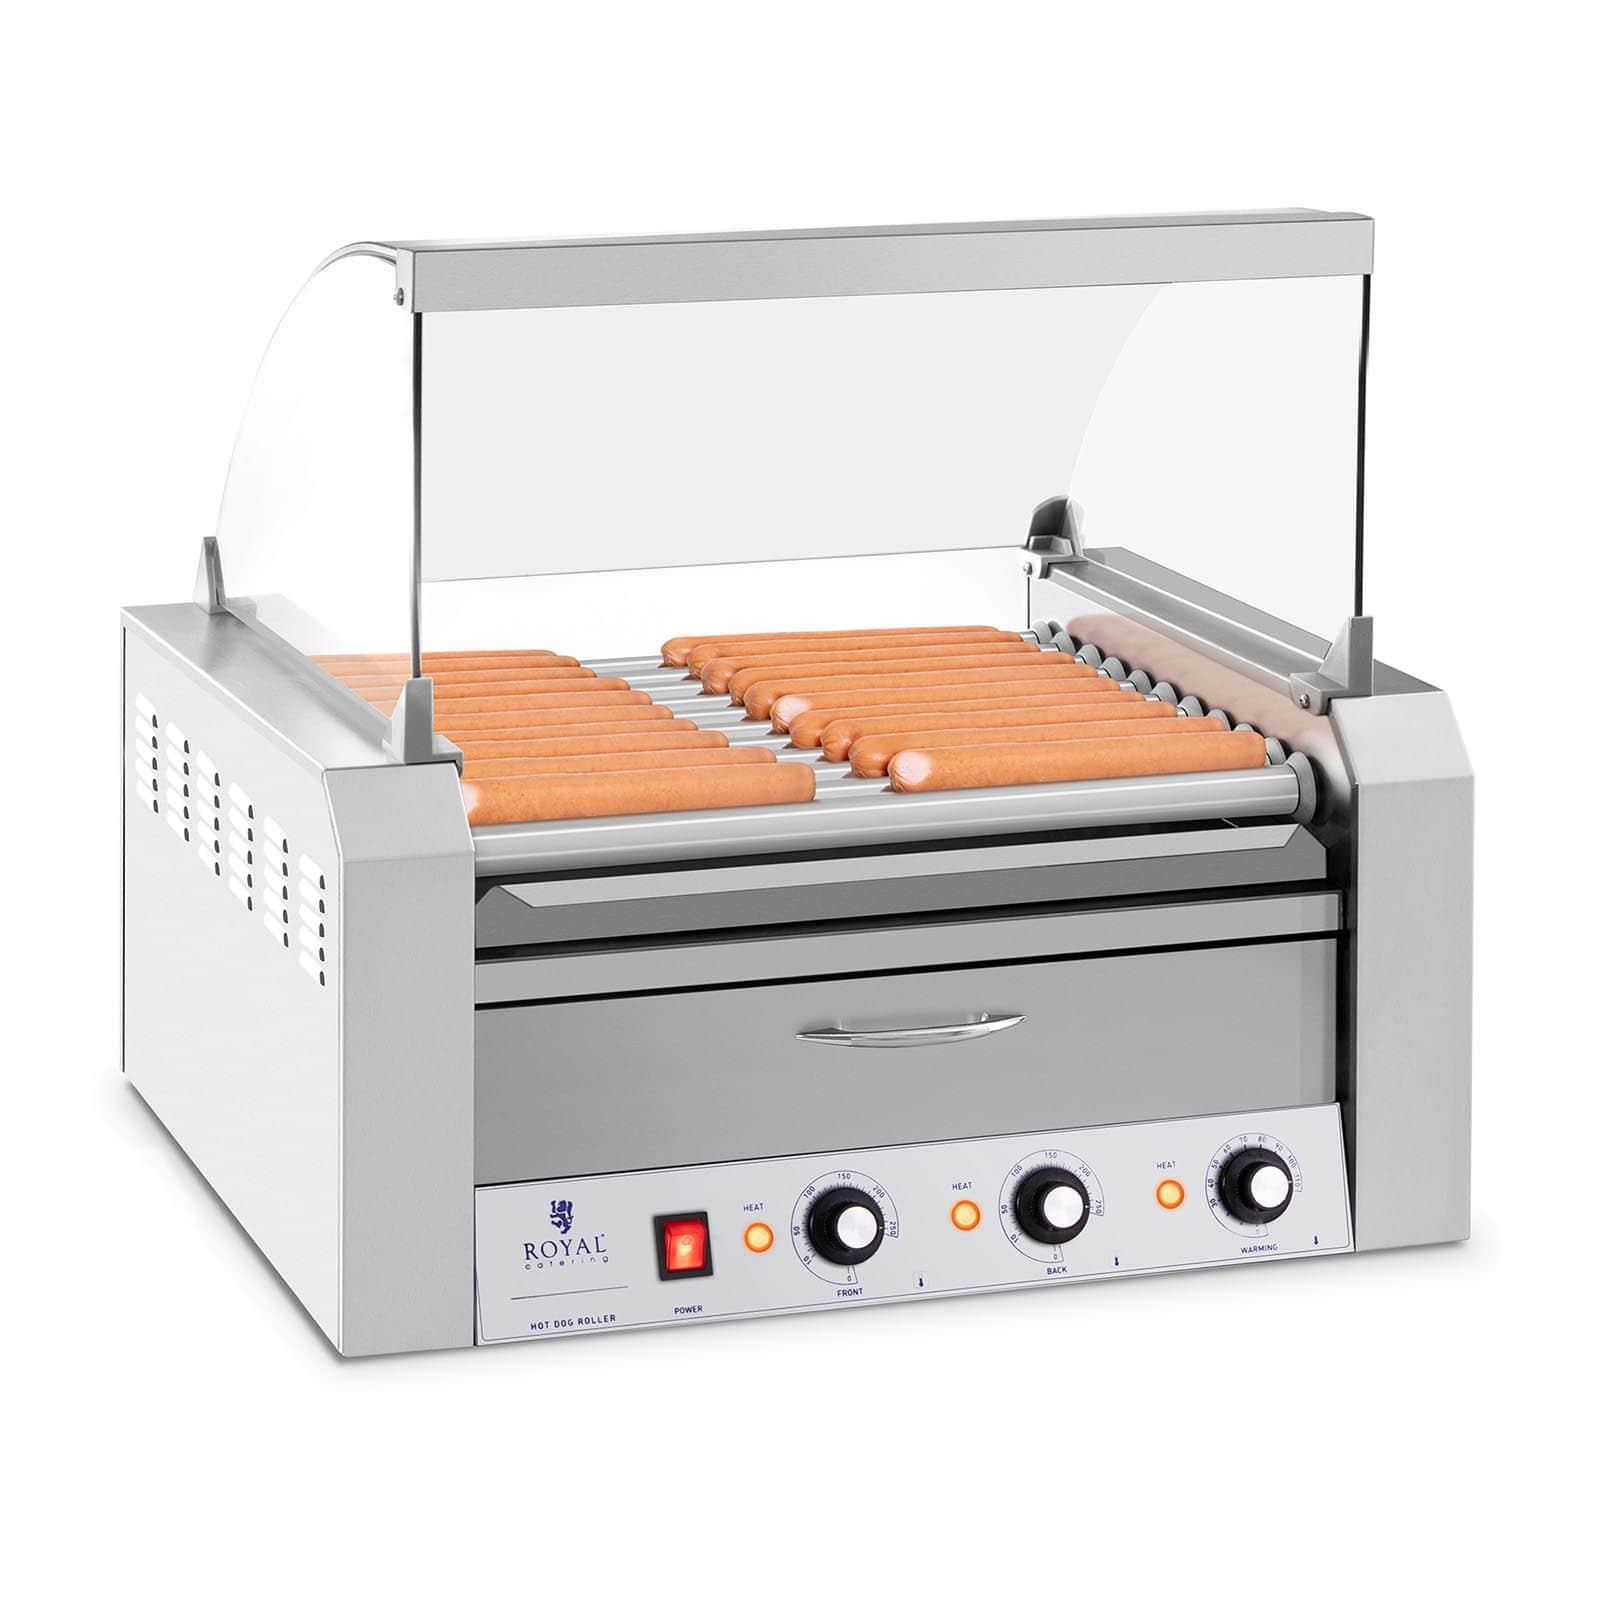 Hotdog grills